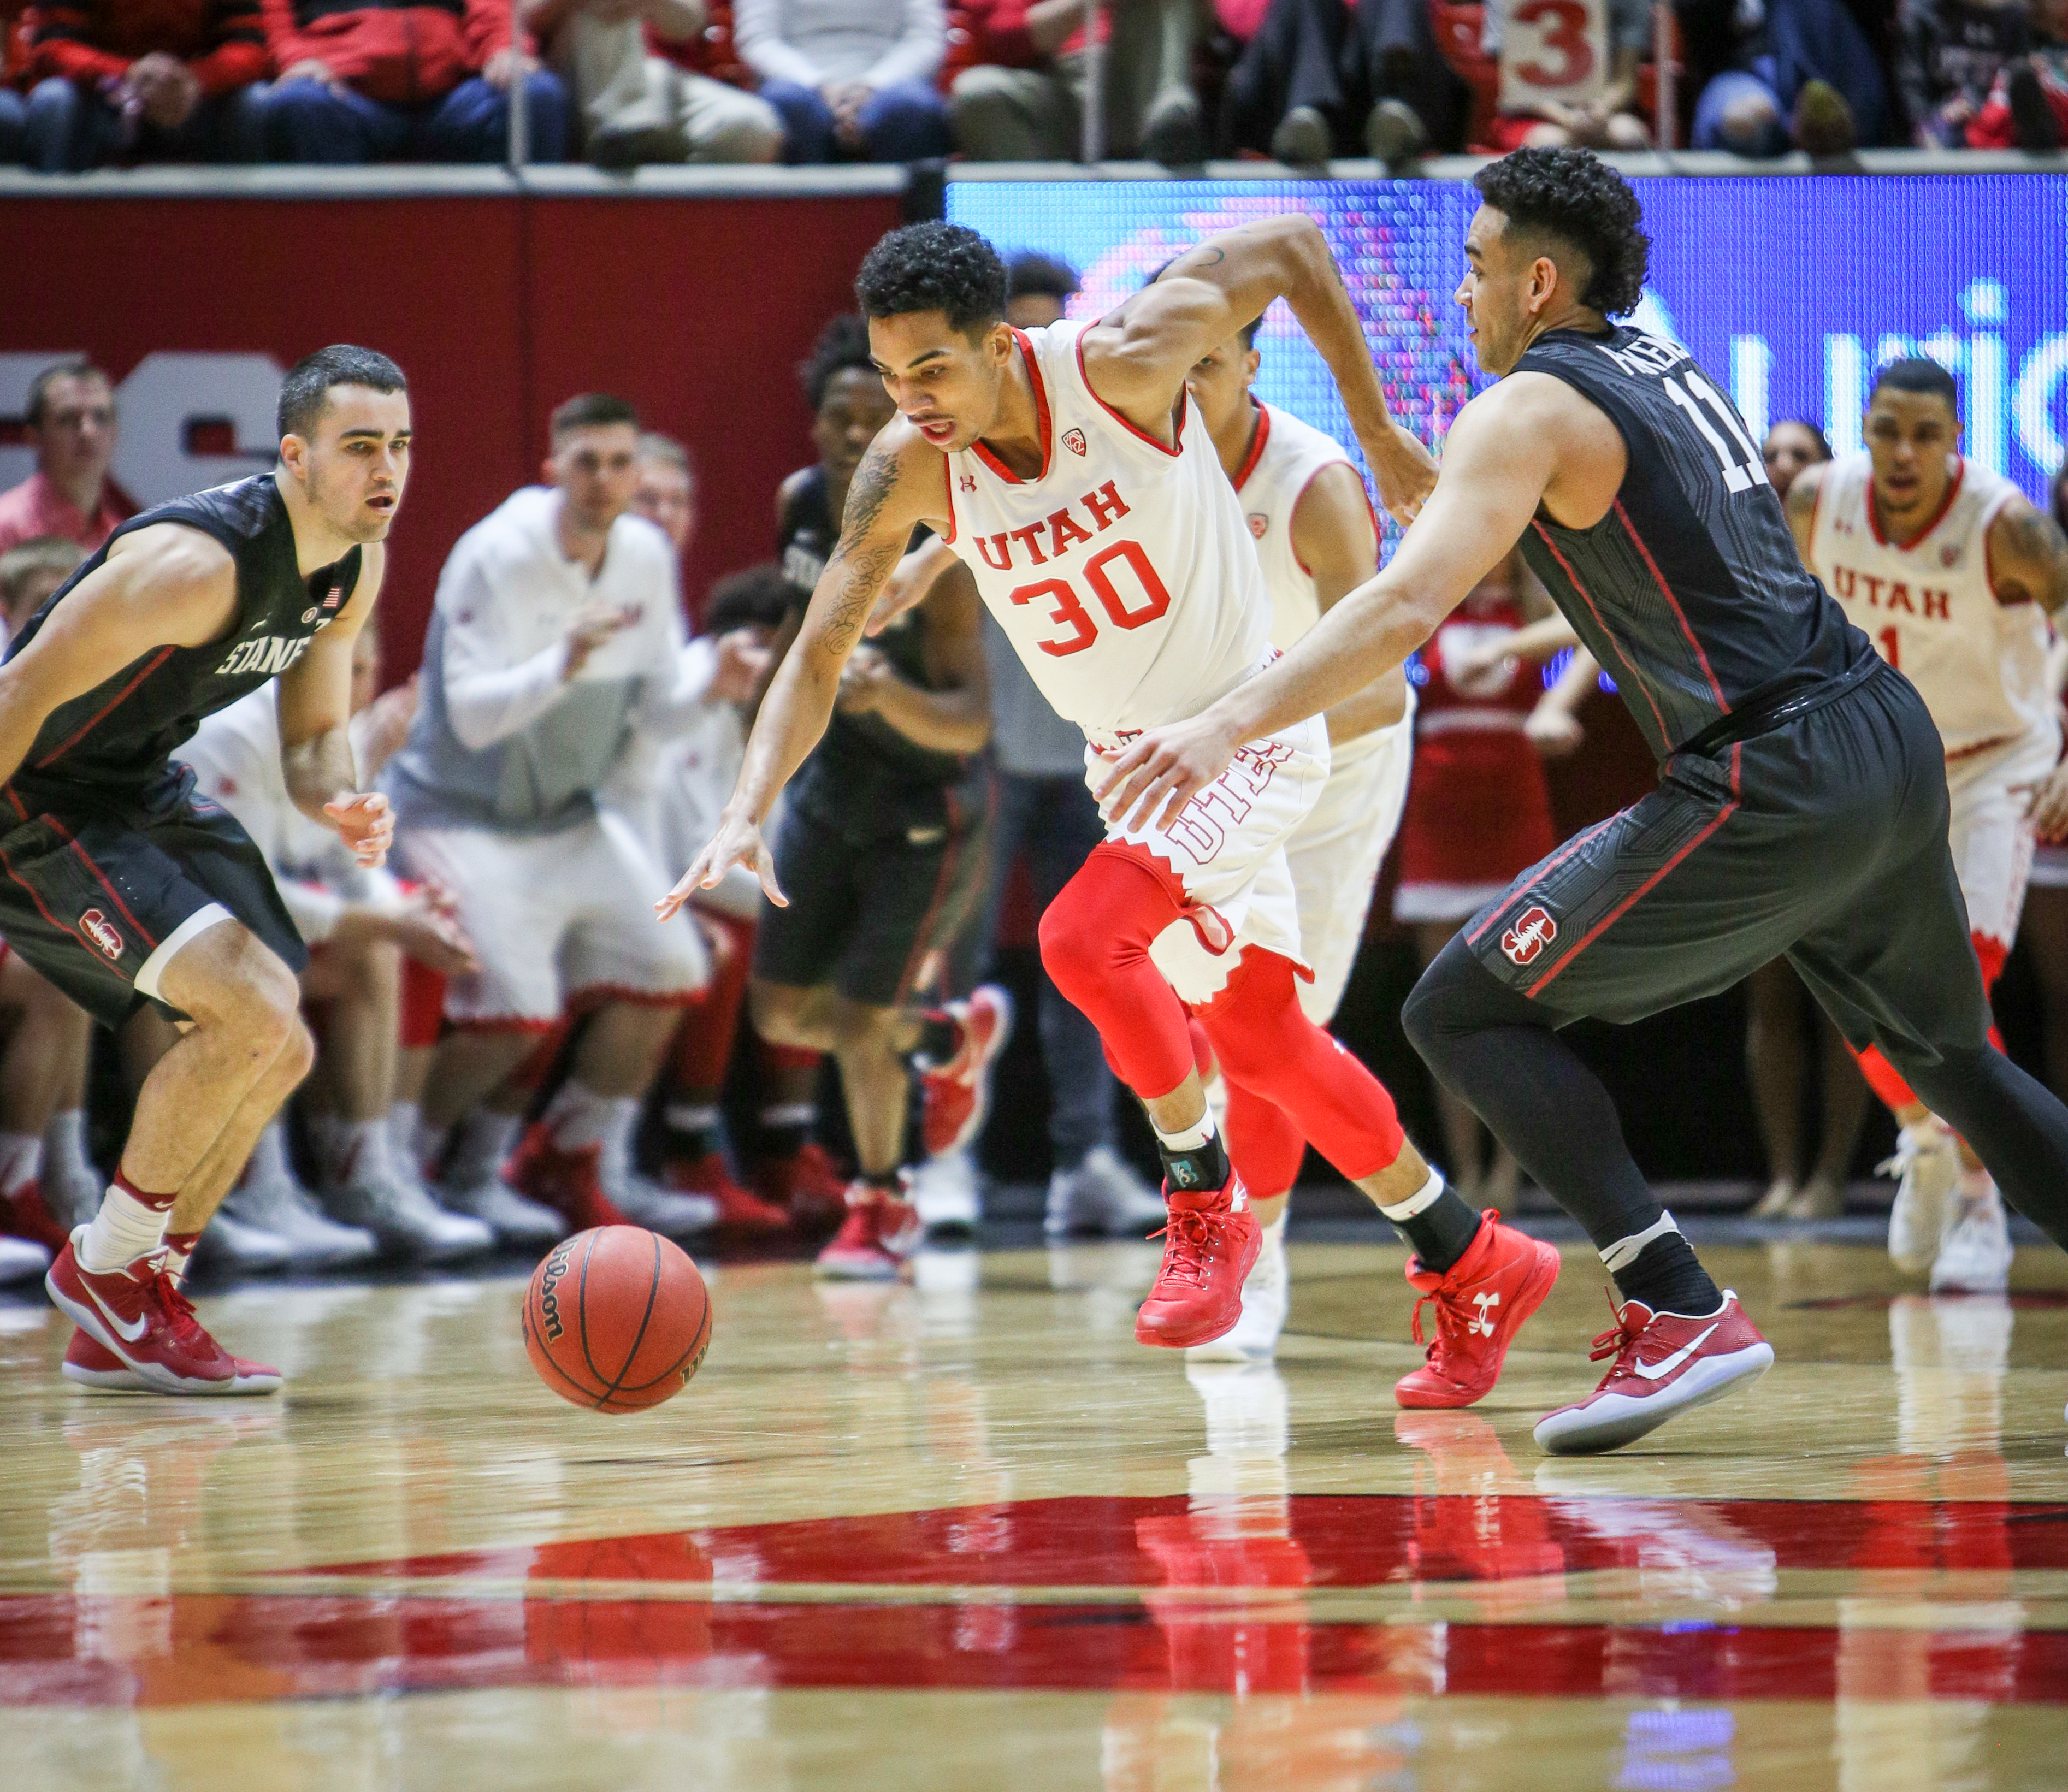 Gabe Bealer dribbling downcourt past the Stanford defense at the Jon Huntsman Center March 4, 2017. Adam Fondren for The Daily Utah Chronicle.